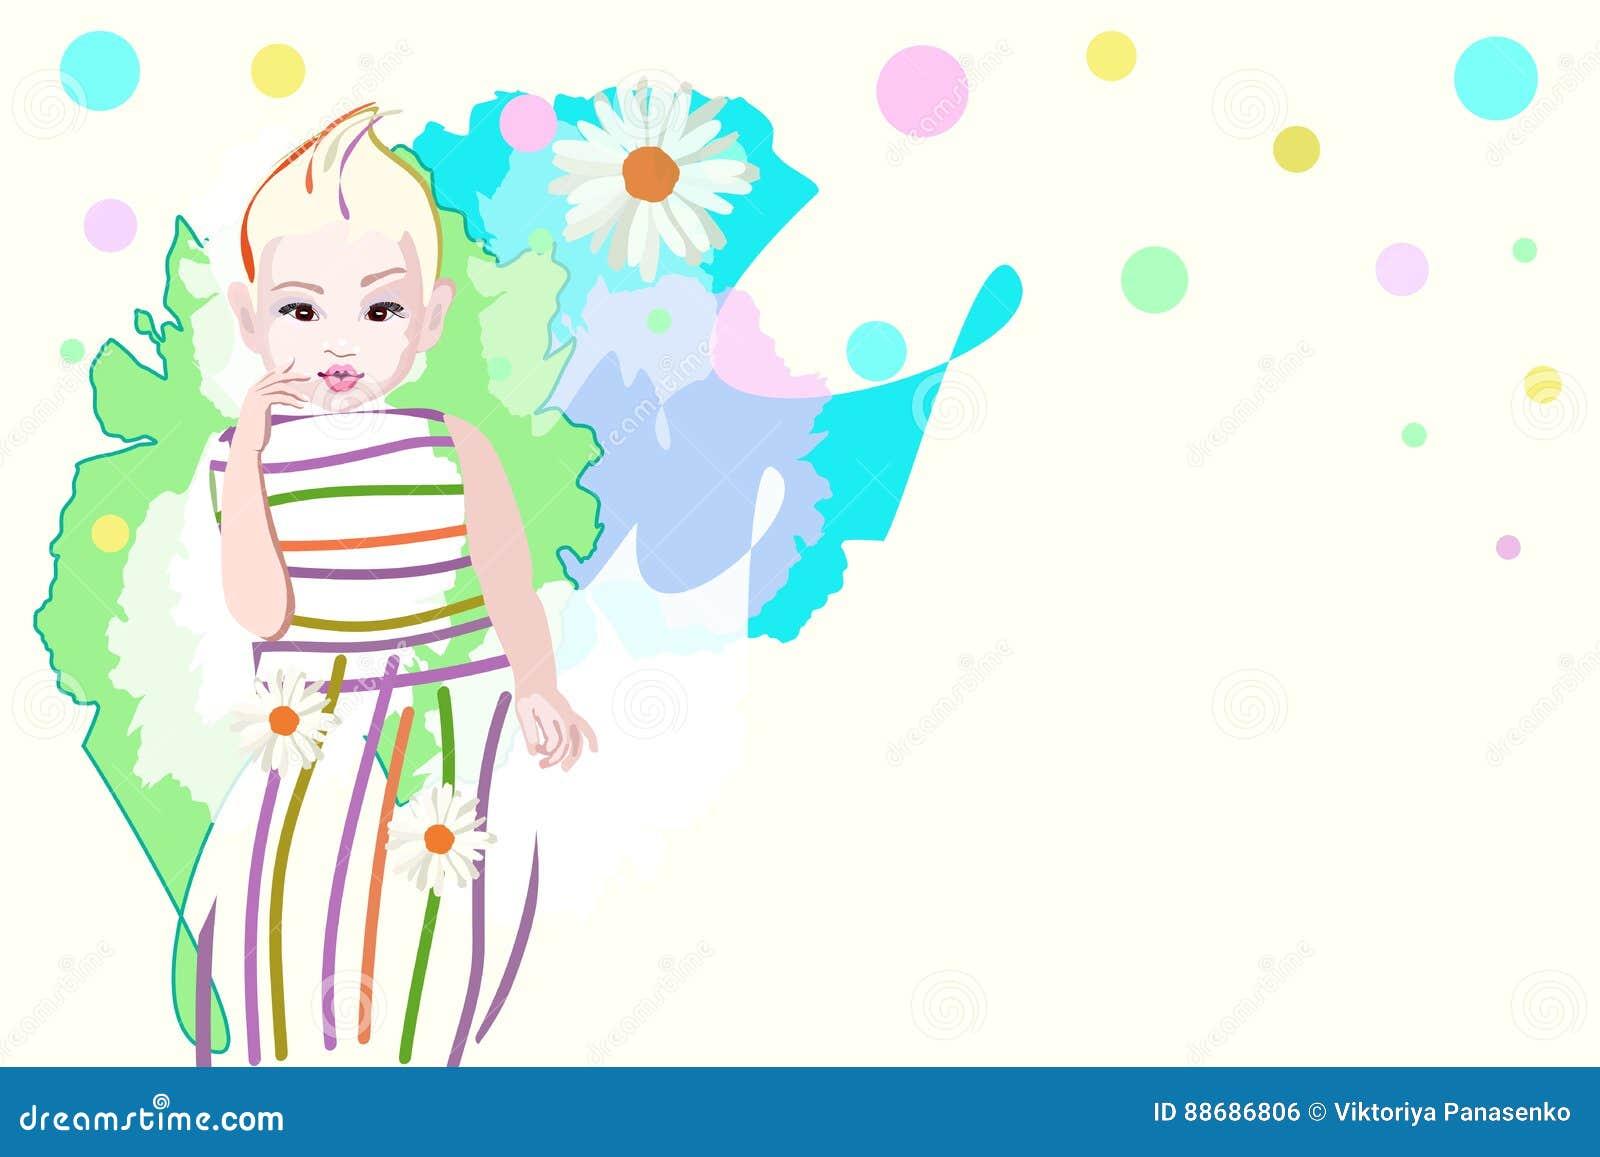 7266b06f4 Abstract Watercolor Illustration Stylish Baby